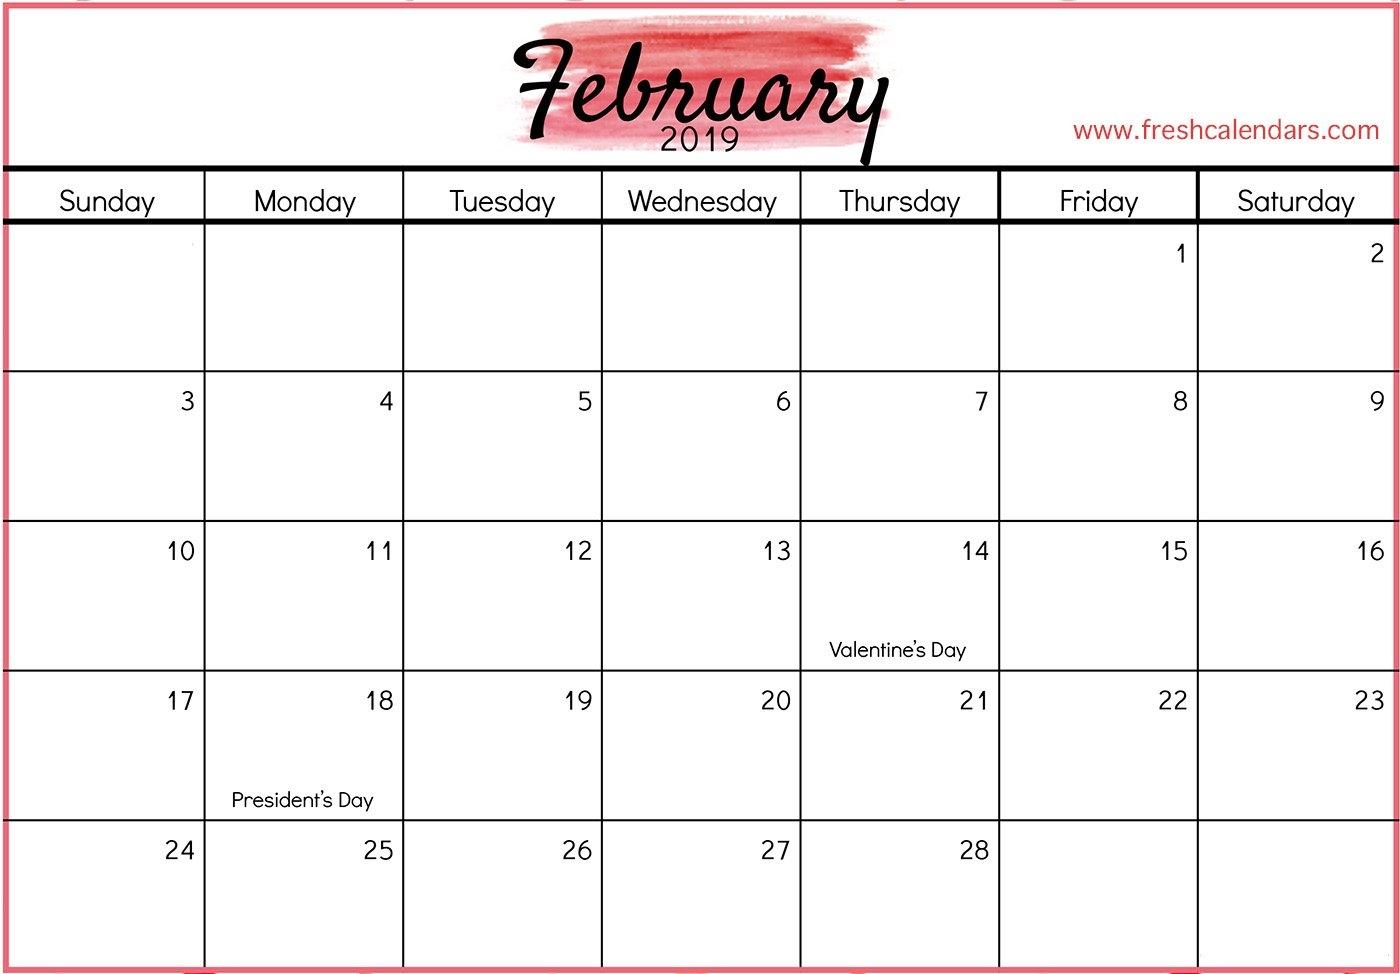 February 2019 Printable Calendars - Fresh Calendars Calendar 2019 February